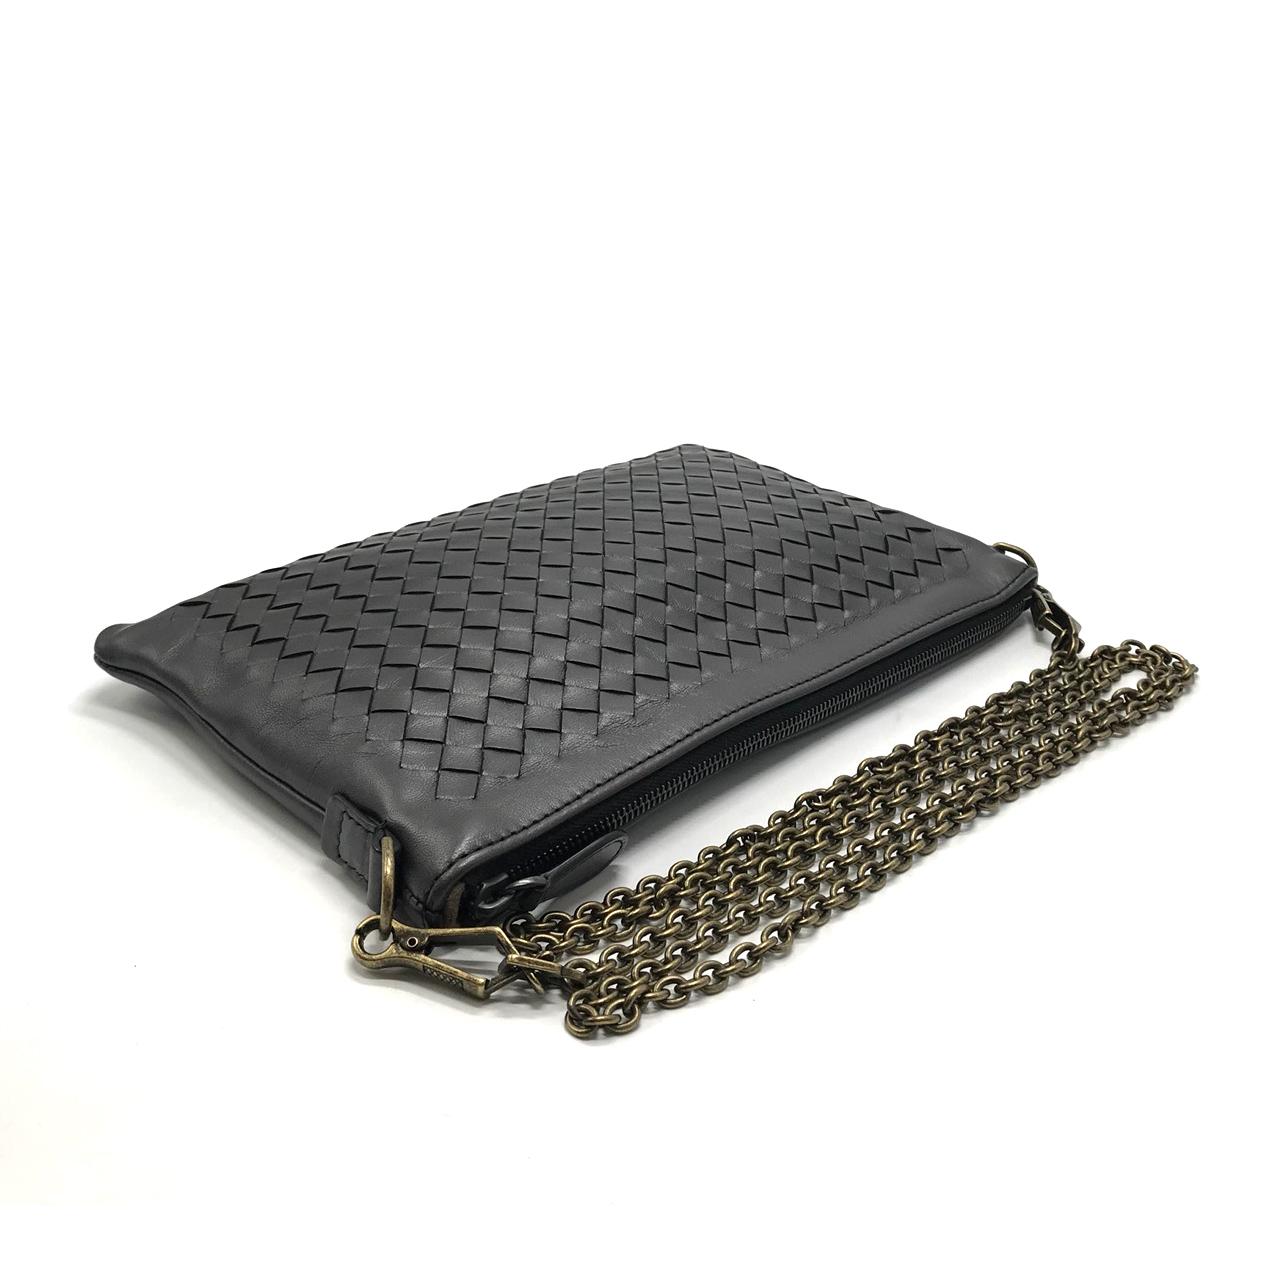 New Bottega Crossbody Bag in Graphite Leather Vintage Gold Hardware